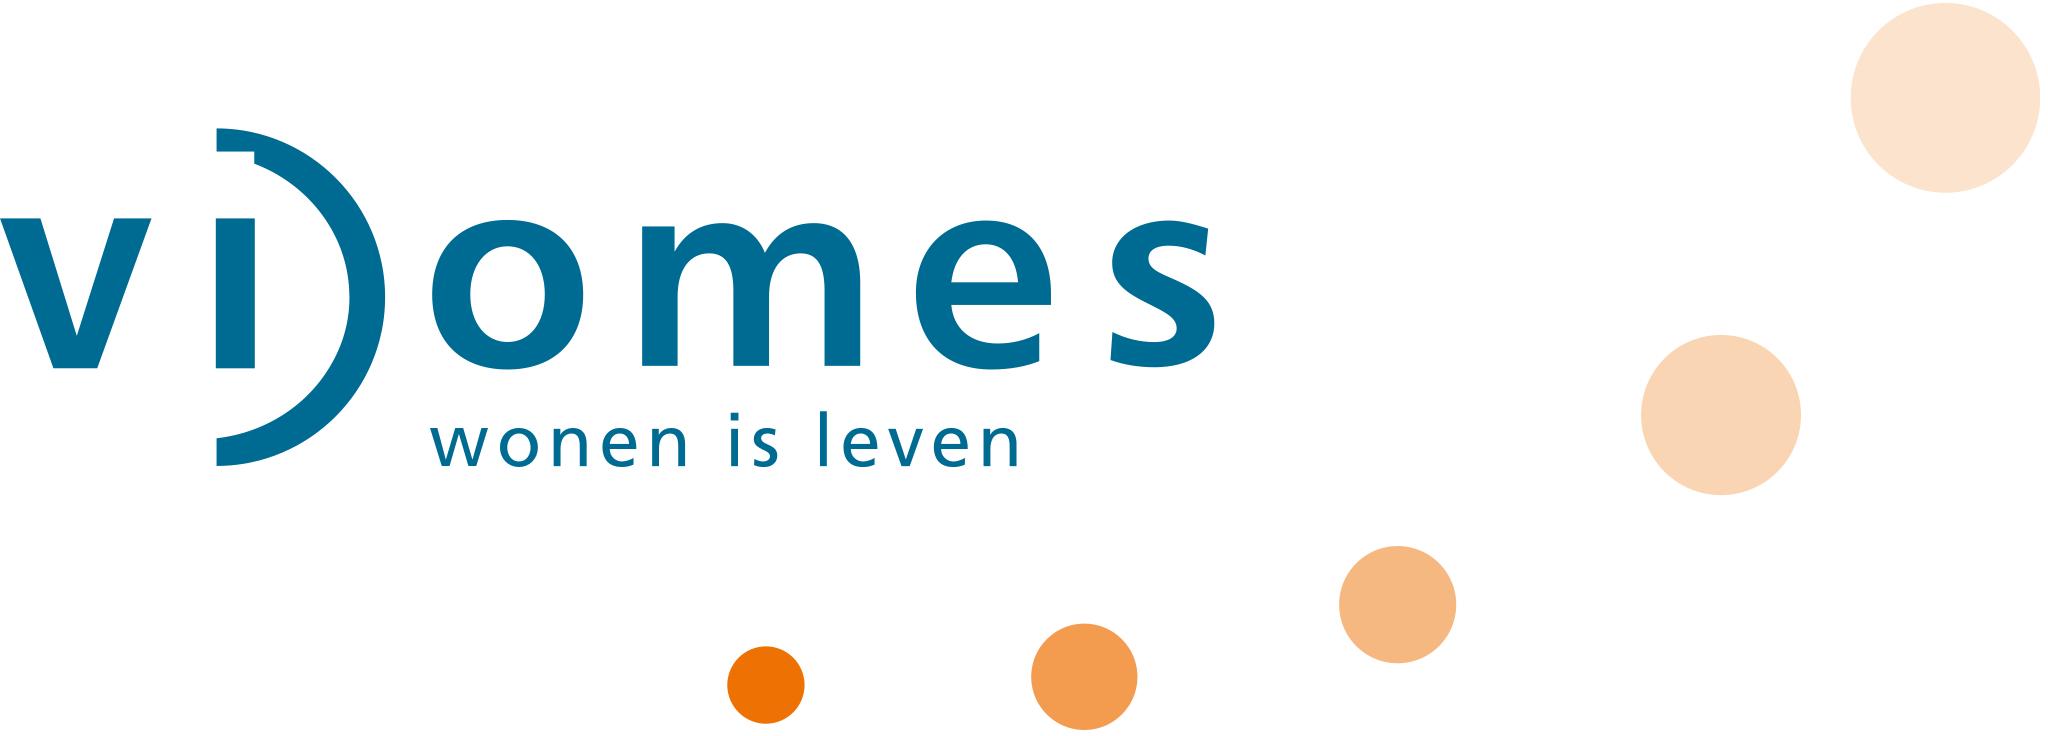 https://klimaatlab.nl/wp-content/uploads/2021/01/Vidomes_logo.jpg